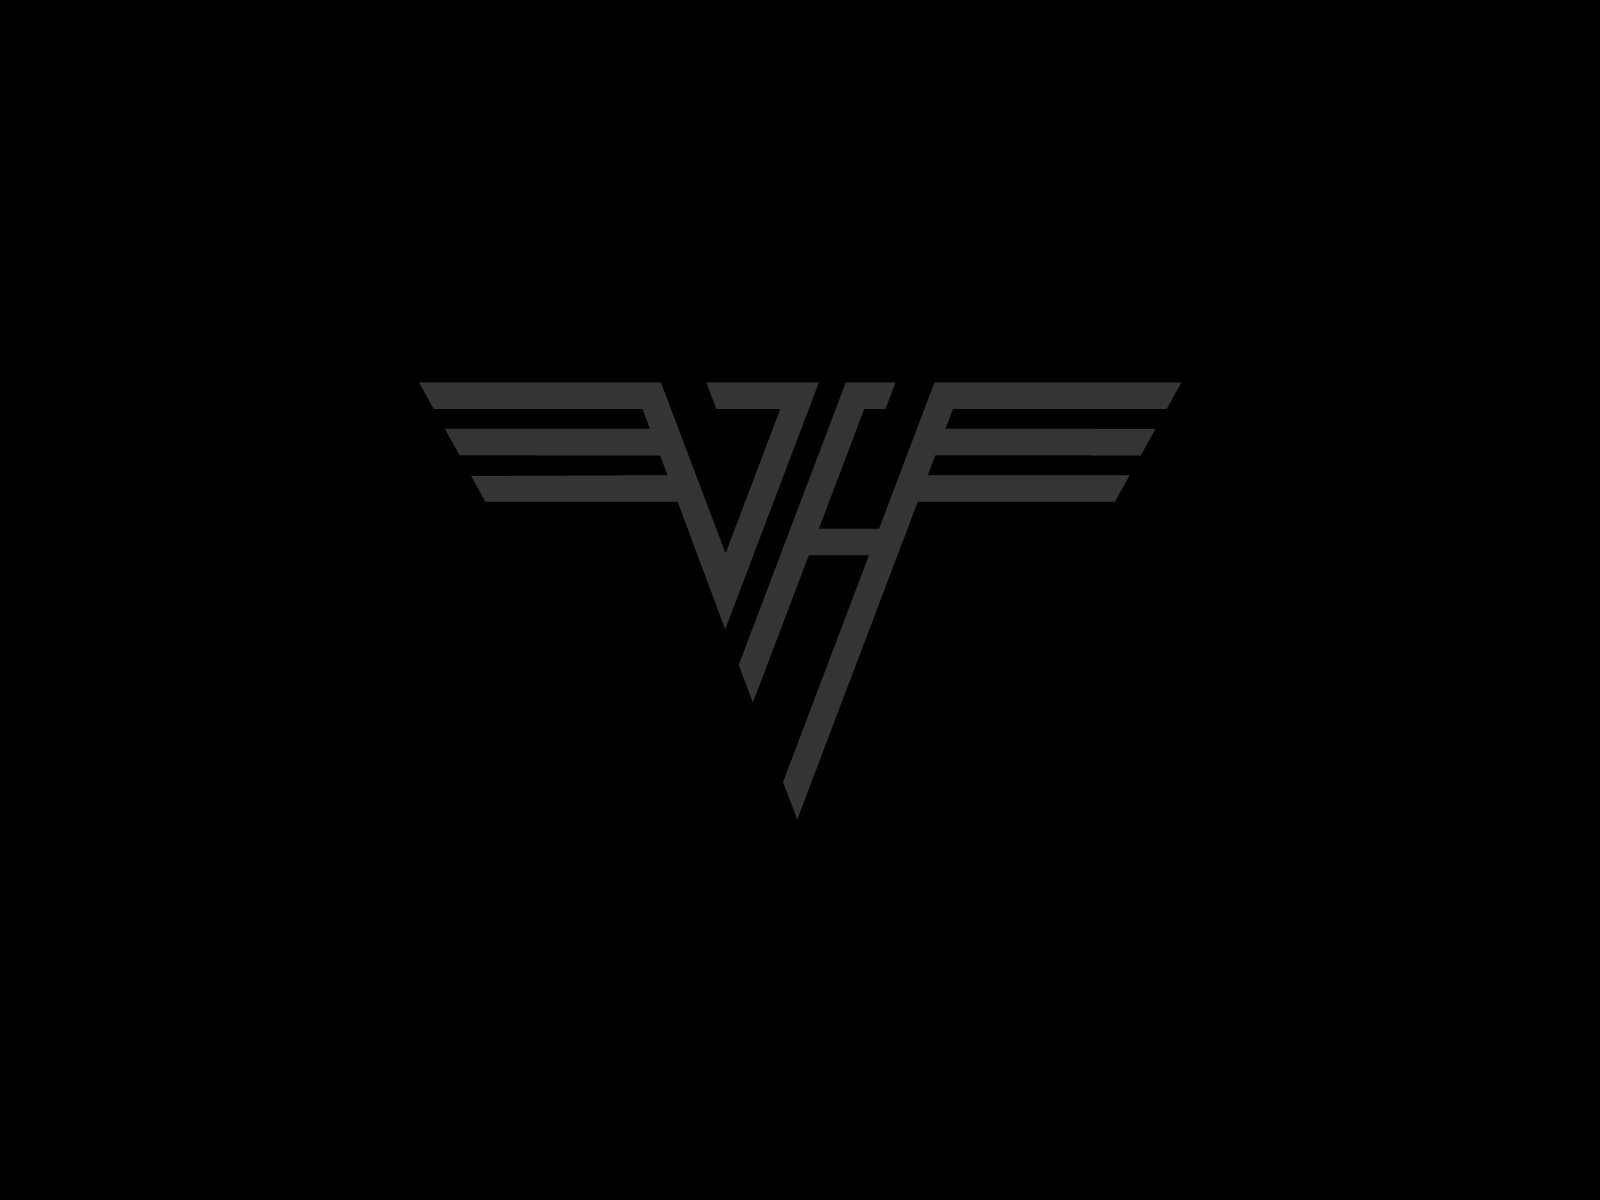 Van Halen logo and wallpaper Band logos   Rock band logos metal 1600x1200